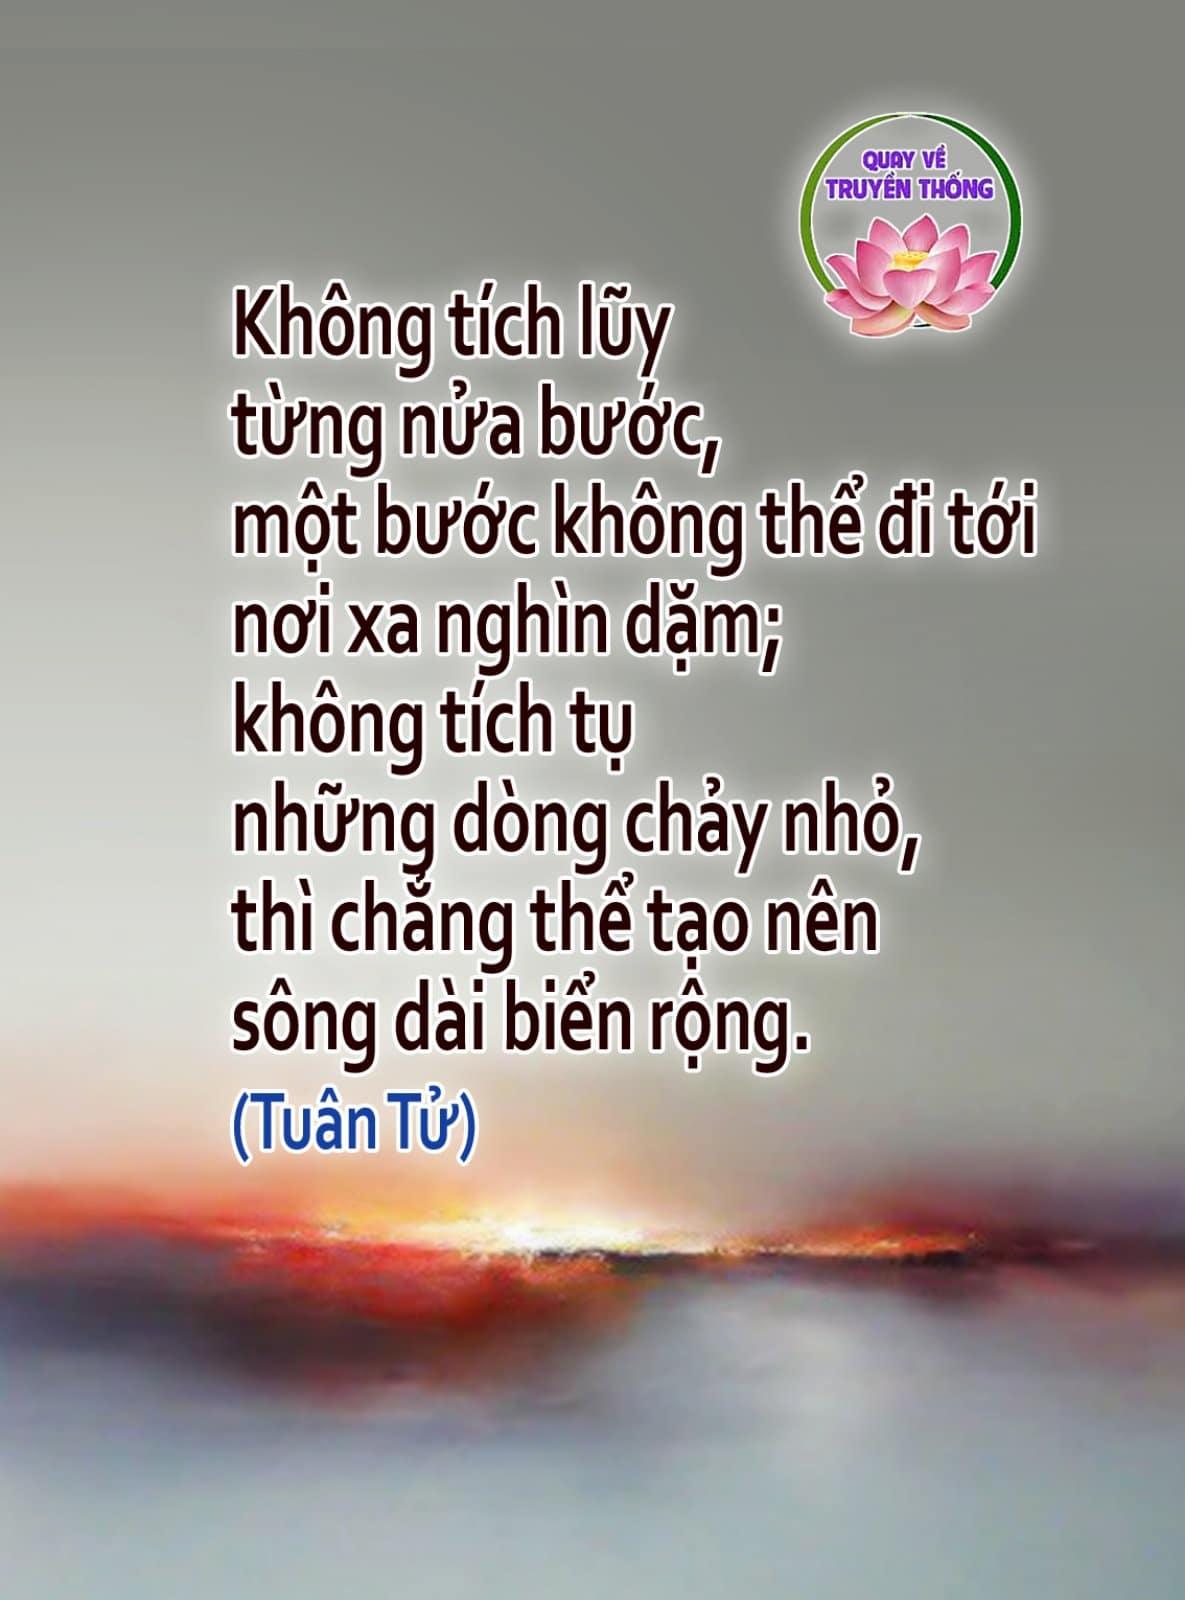 quayvetruyenthong.org